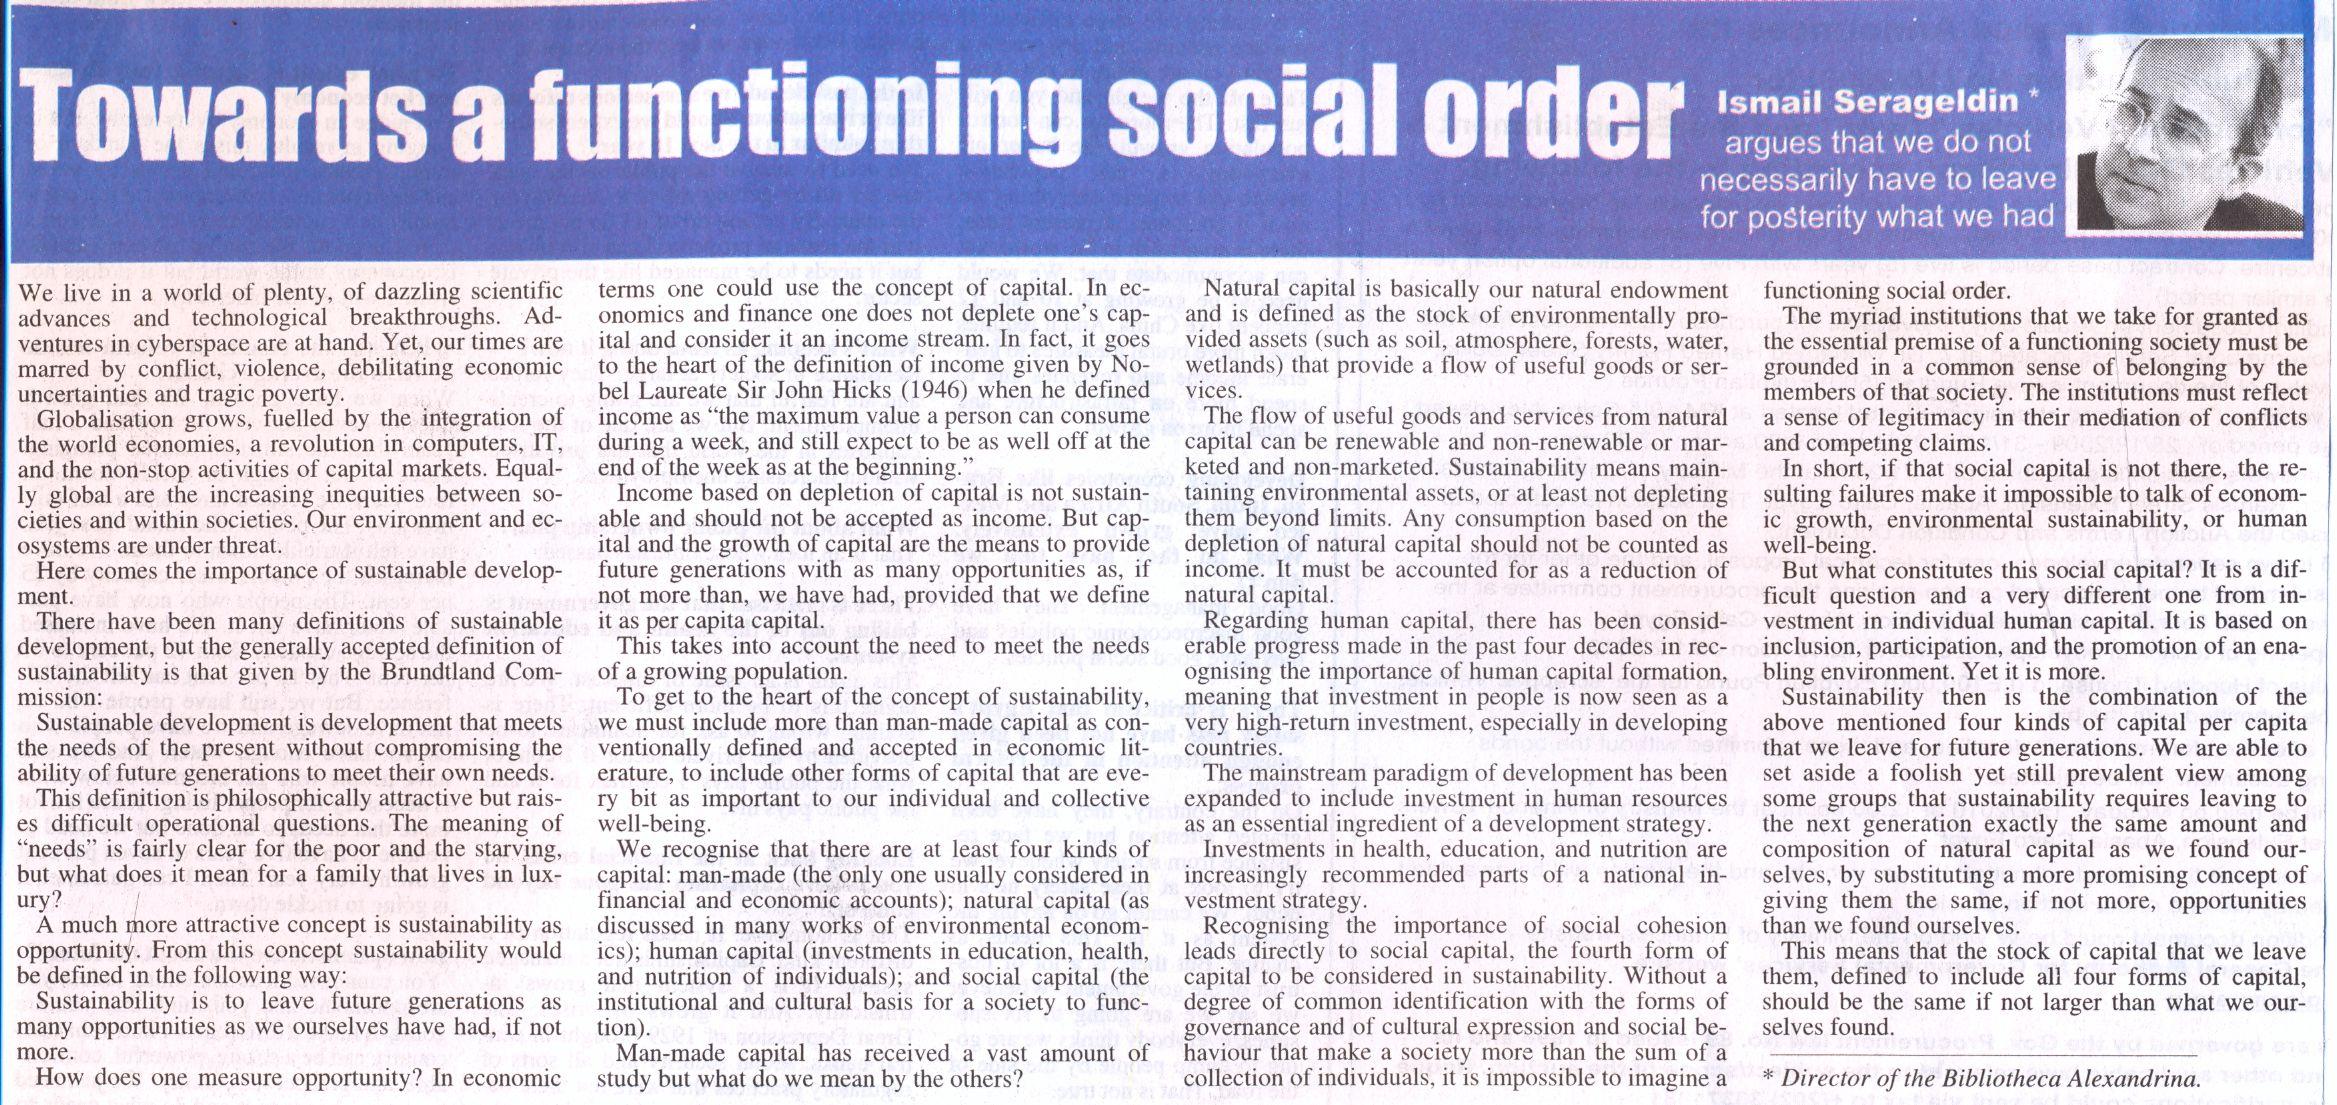 towards a functioning social order